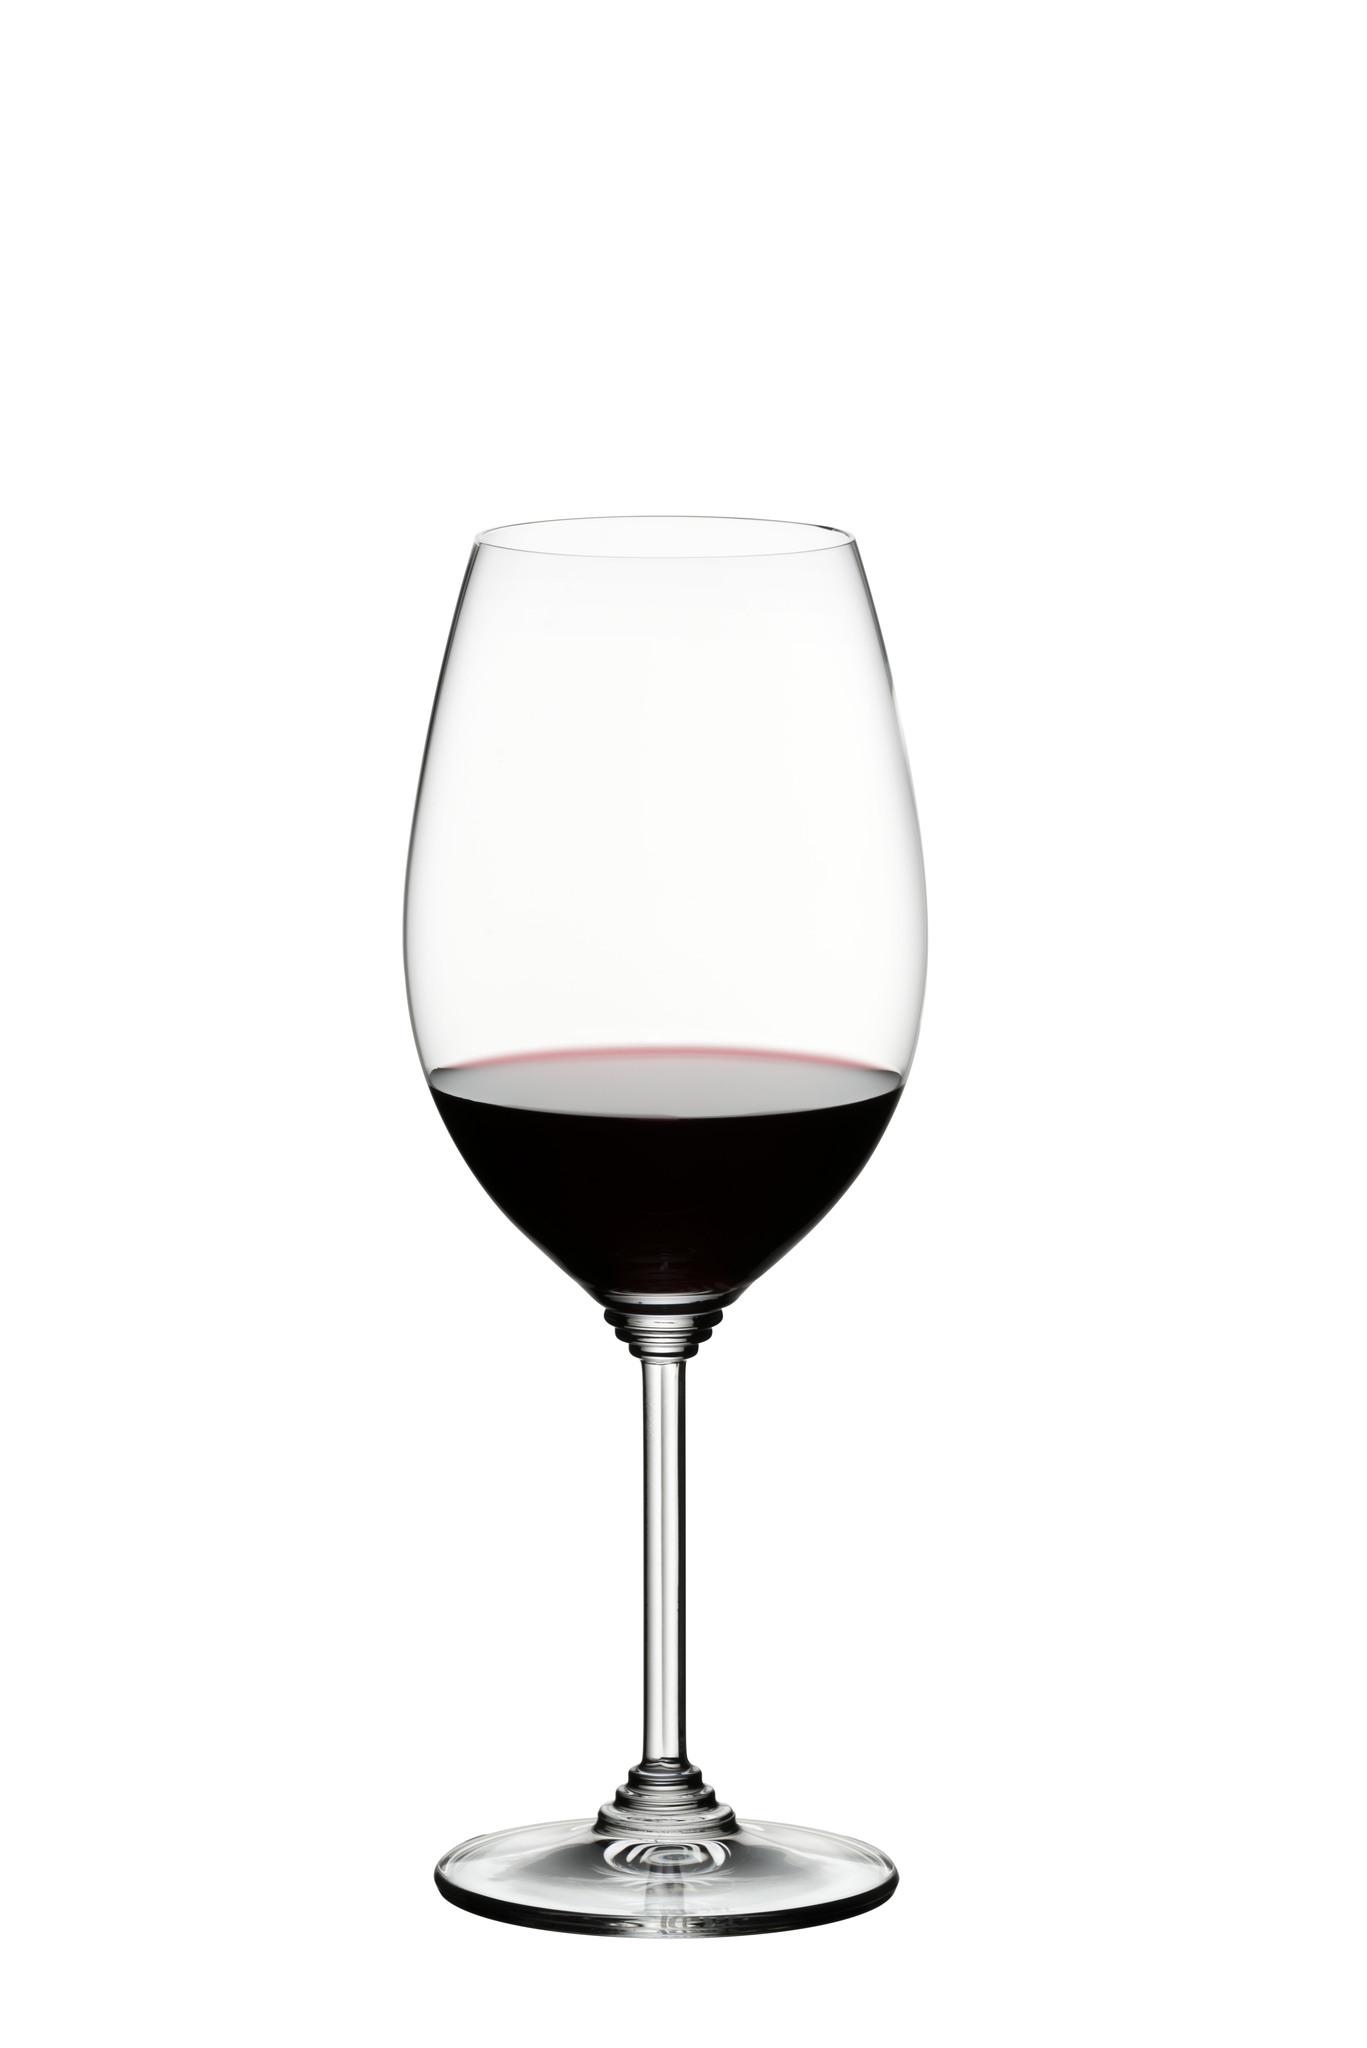 Бокалы Набор бокалов для красного вина 2шт 650мл Riedel Wine Syrah/Shiraz nabor-bokalov-dlya-krasnogo-vina-2-sht-650-ml-riedel-wine-syrahshiraz-avstriya-foto.jpg